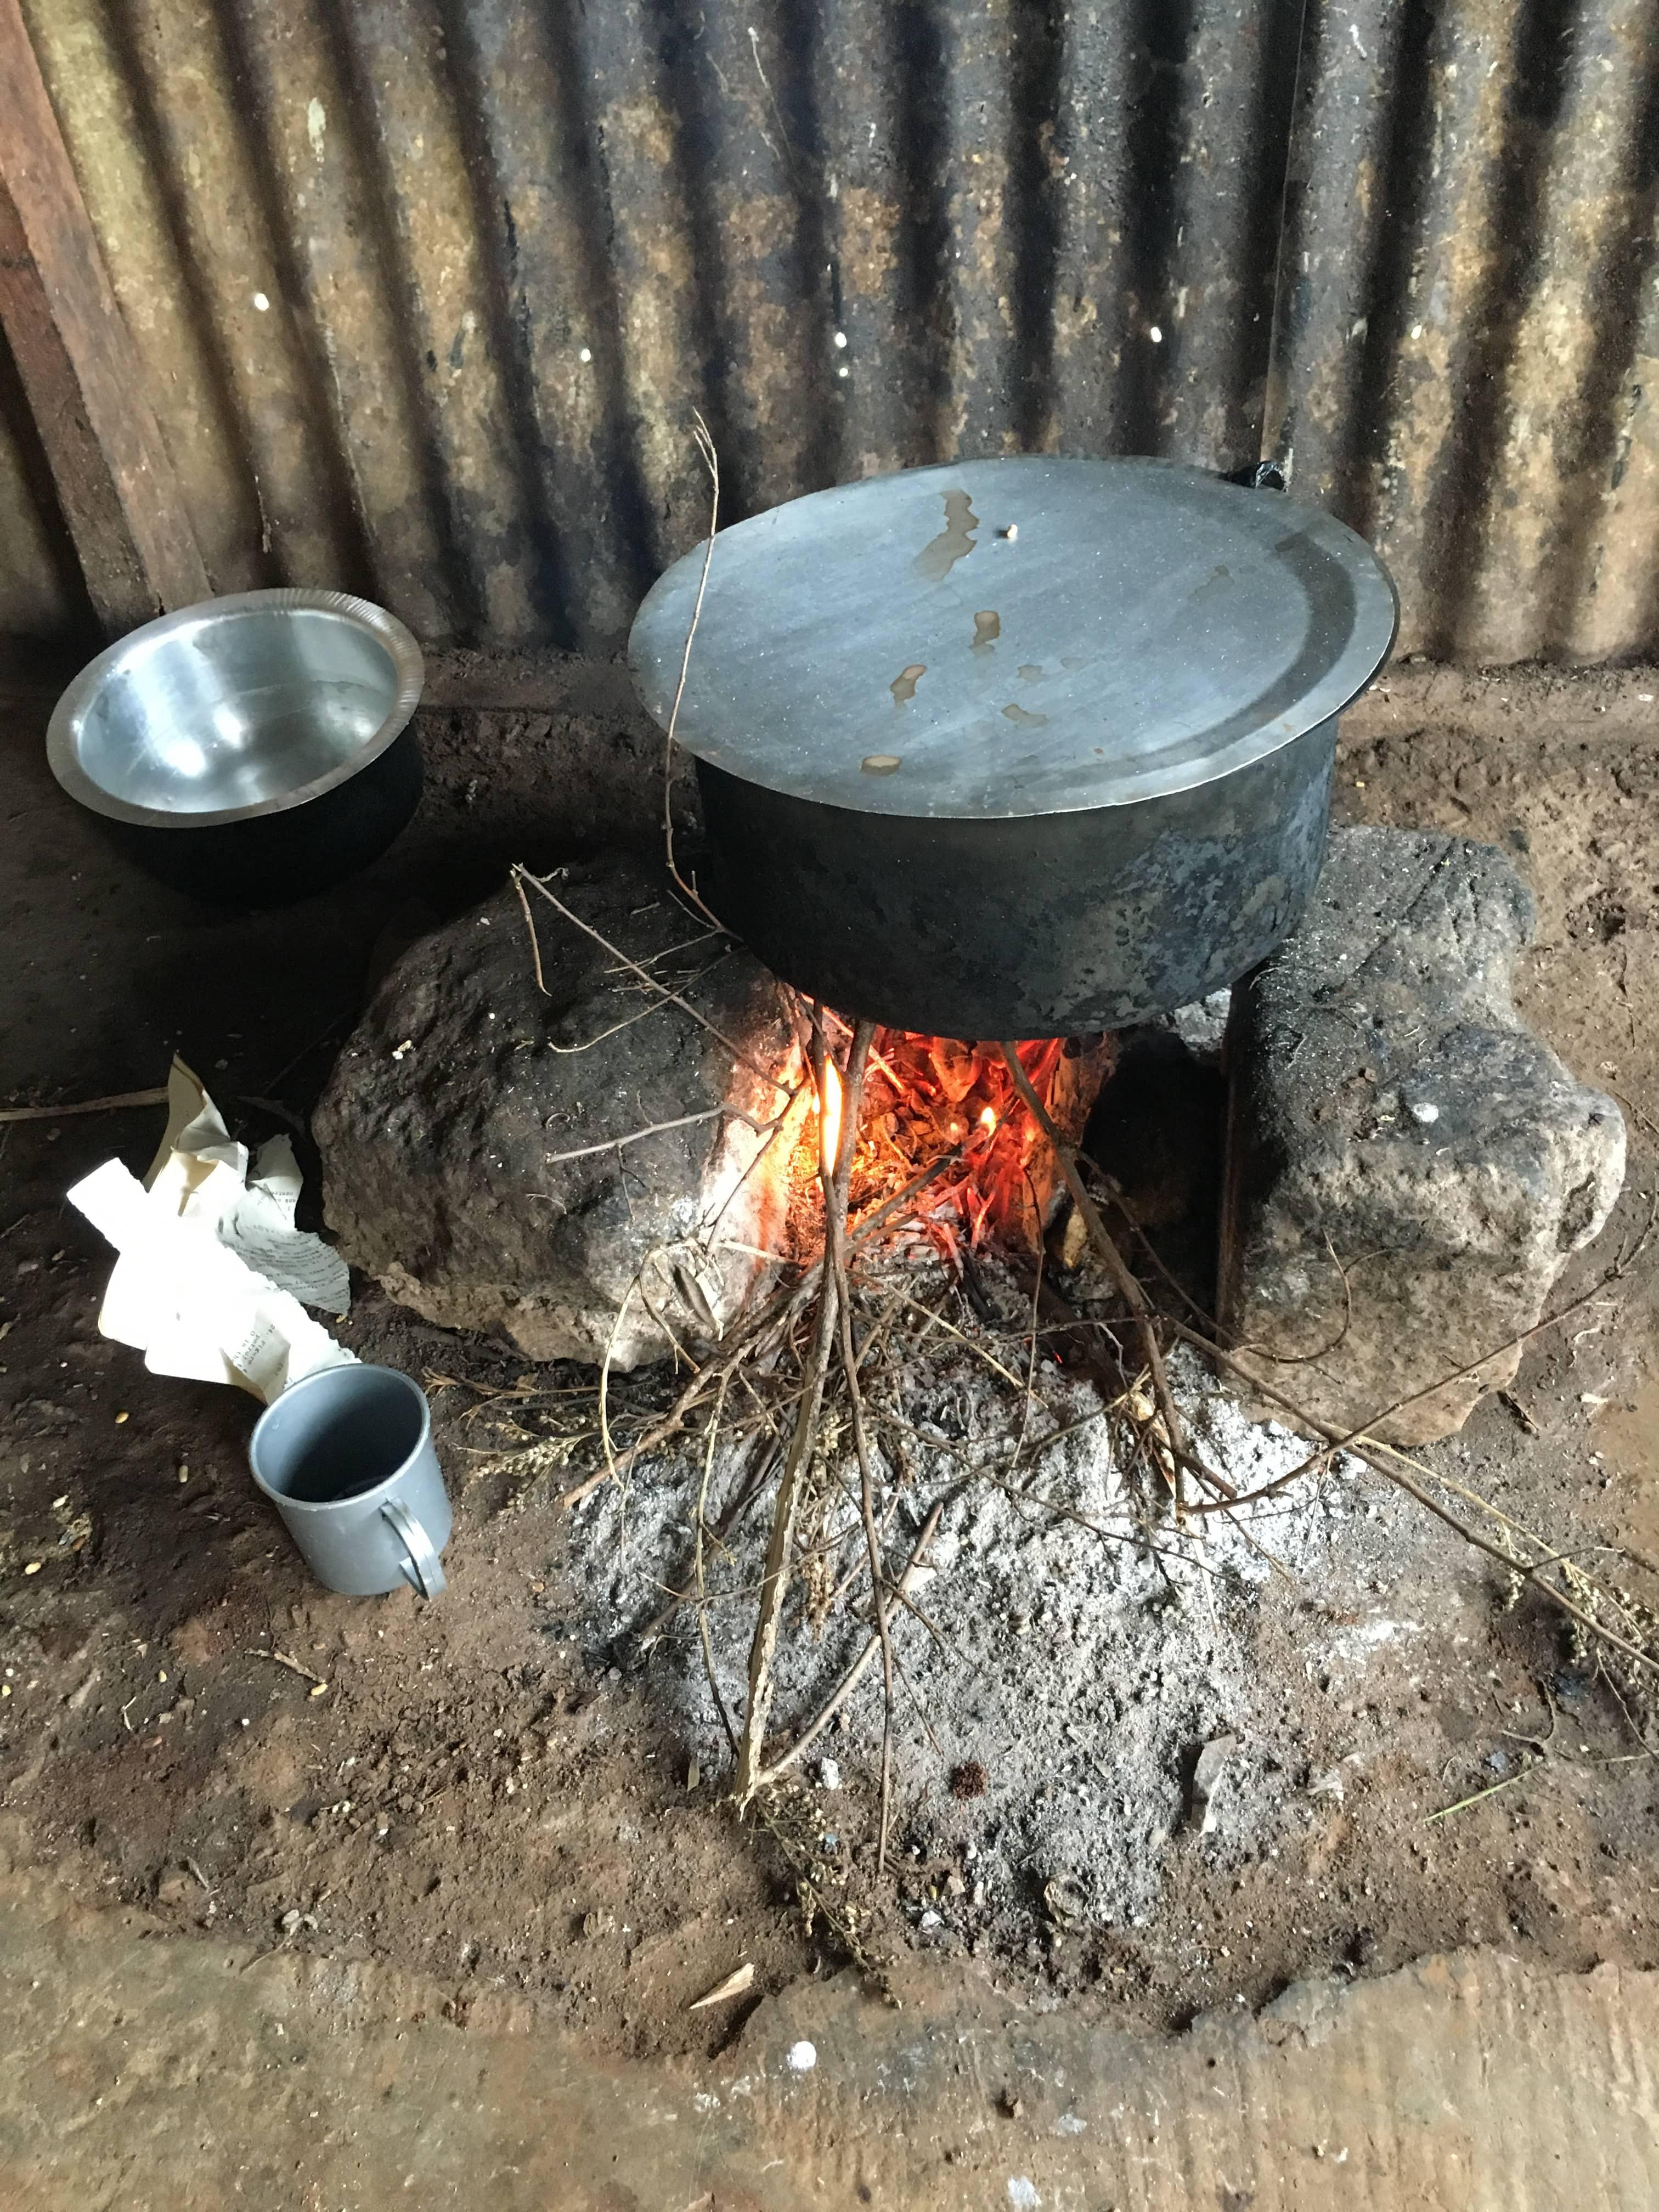 kenya maasai cooking stove